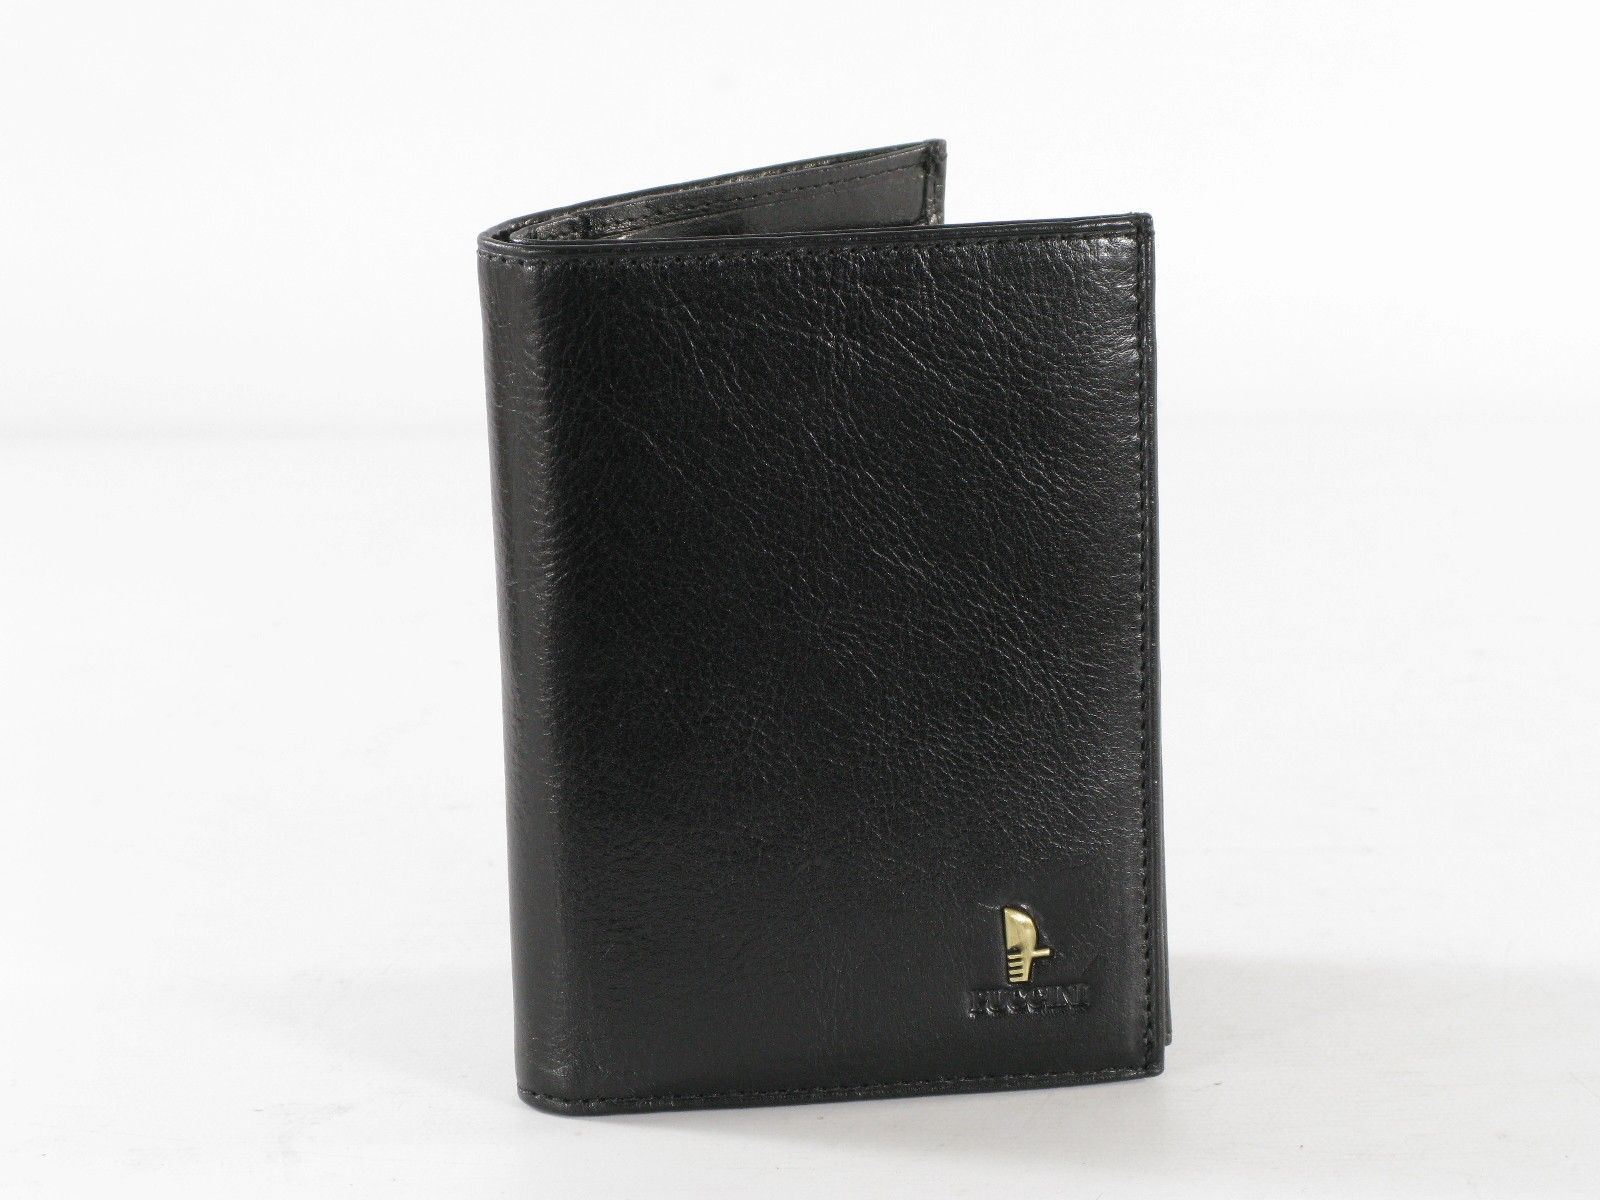 f1bd9963d77f0 portfel męski skórzany allegro czarny puccini klasyczny ...